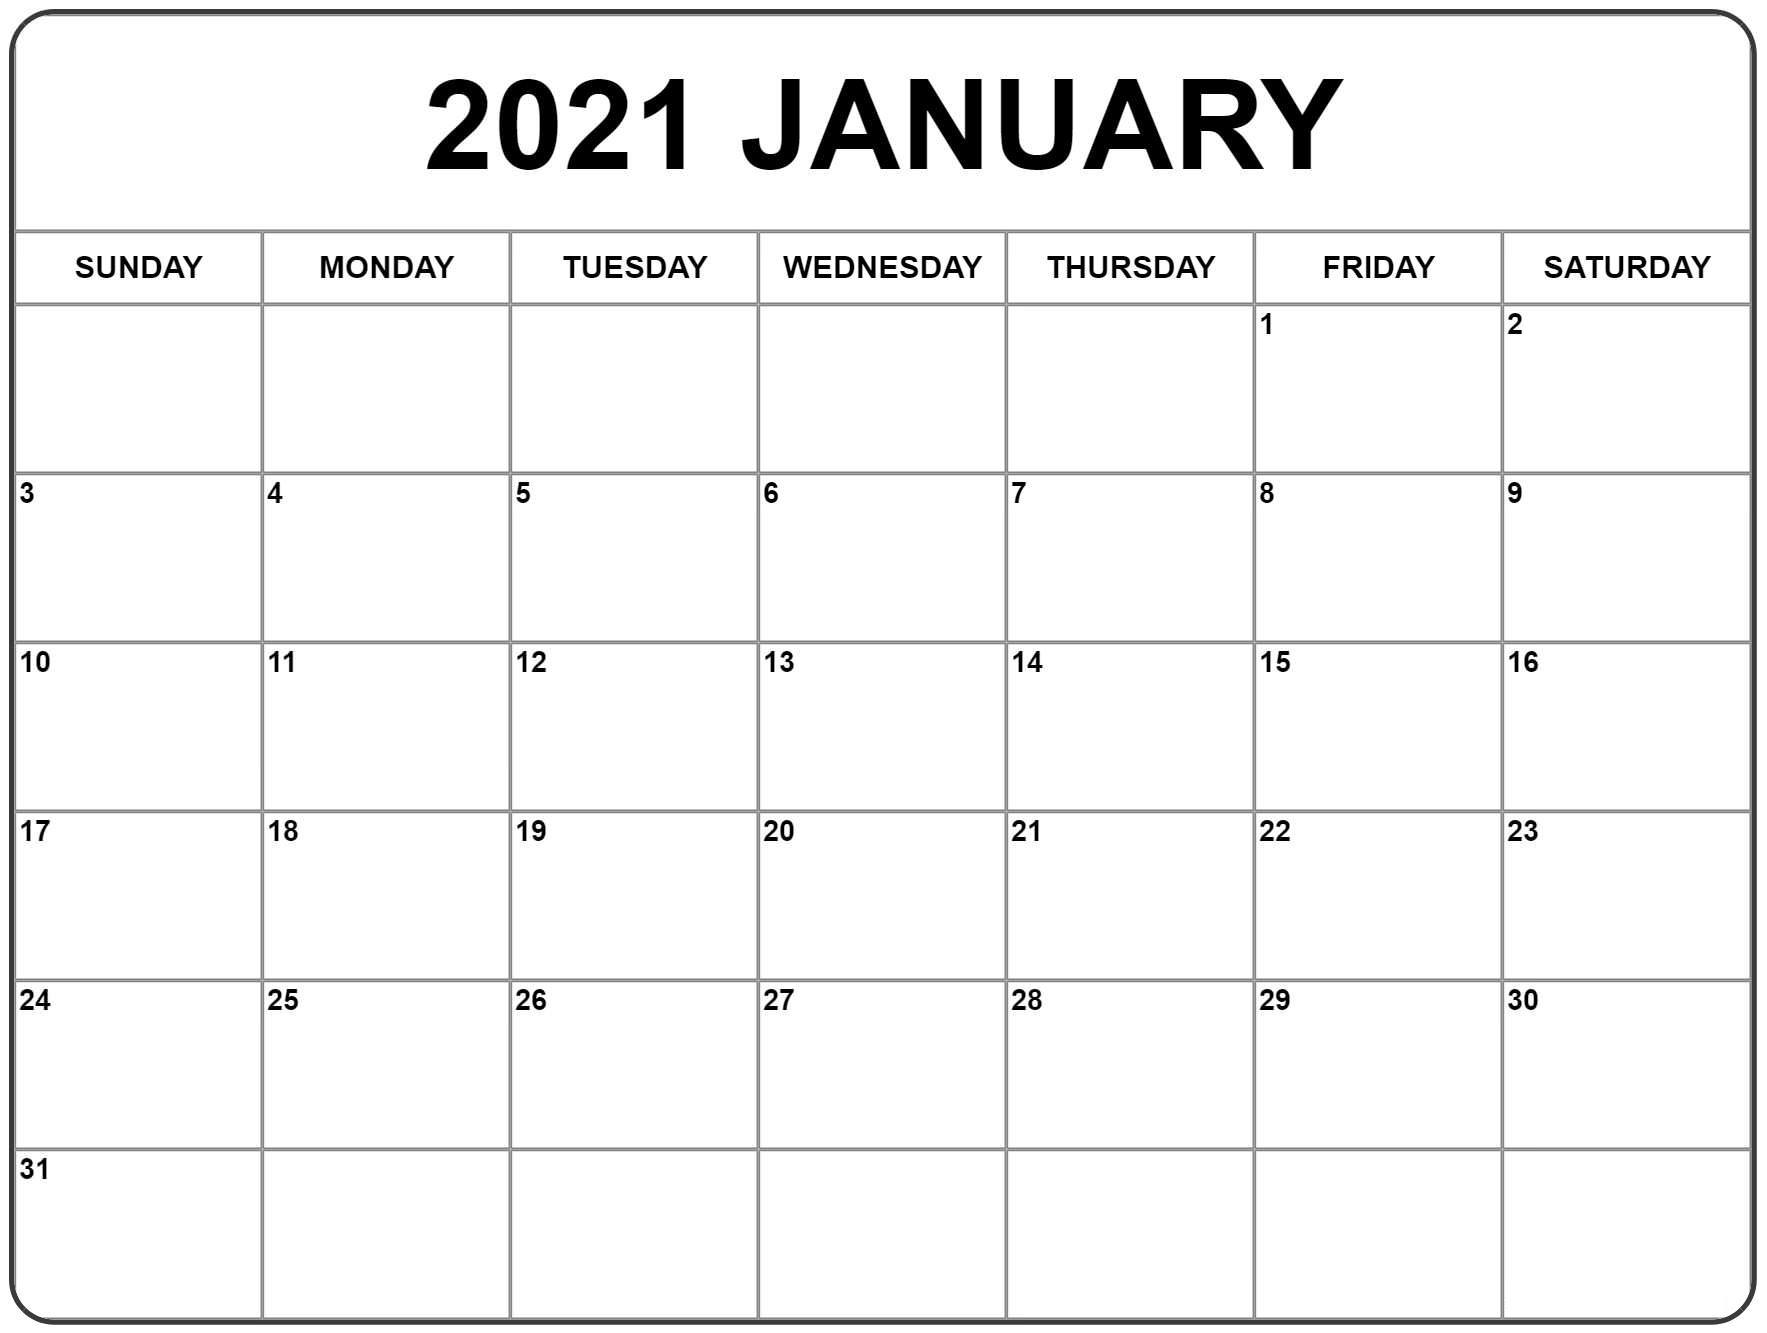 January 2021 Calendar Image